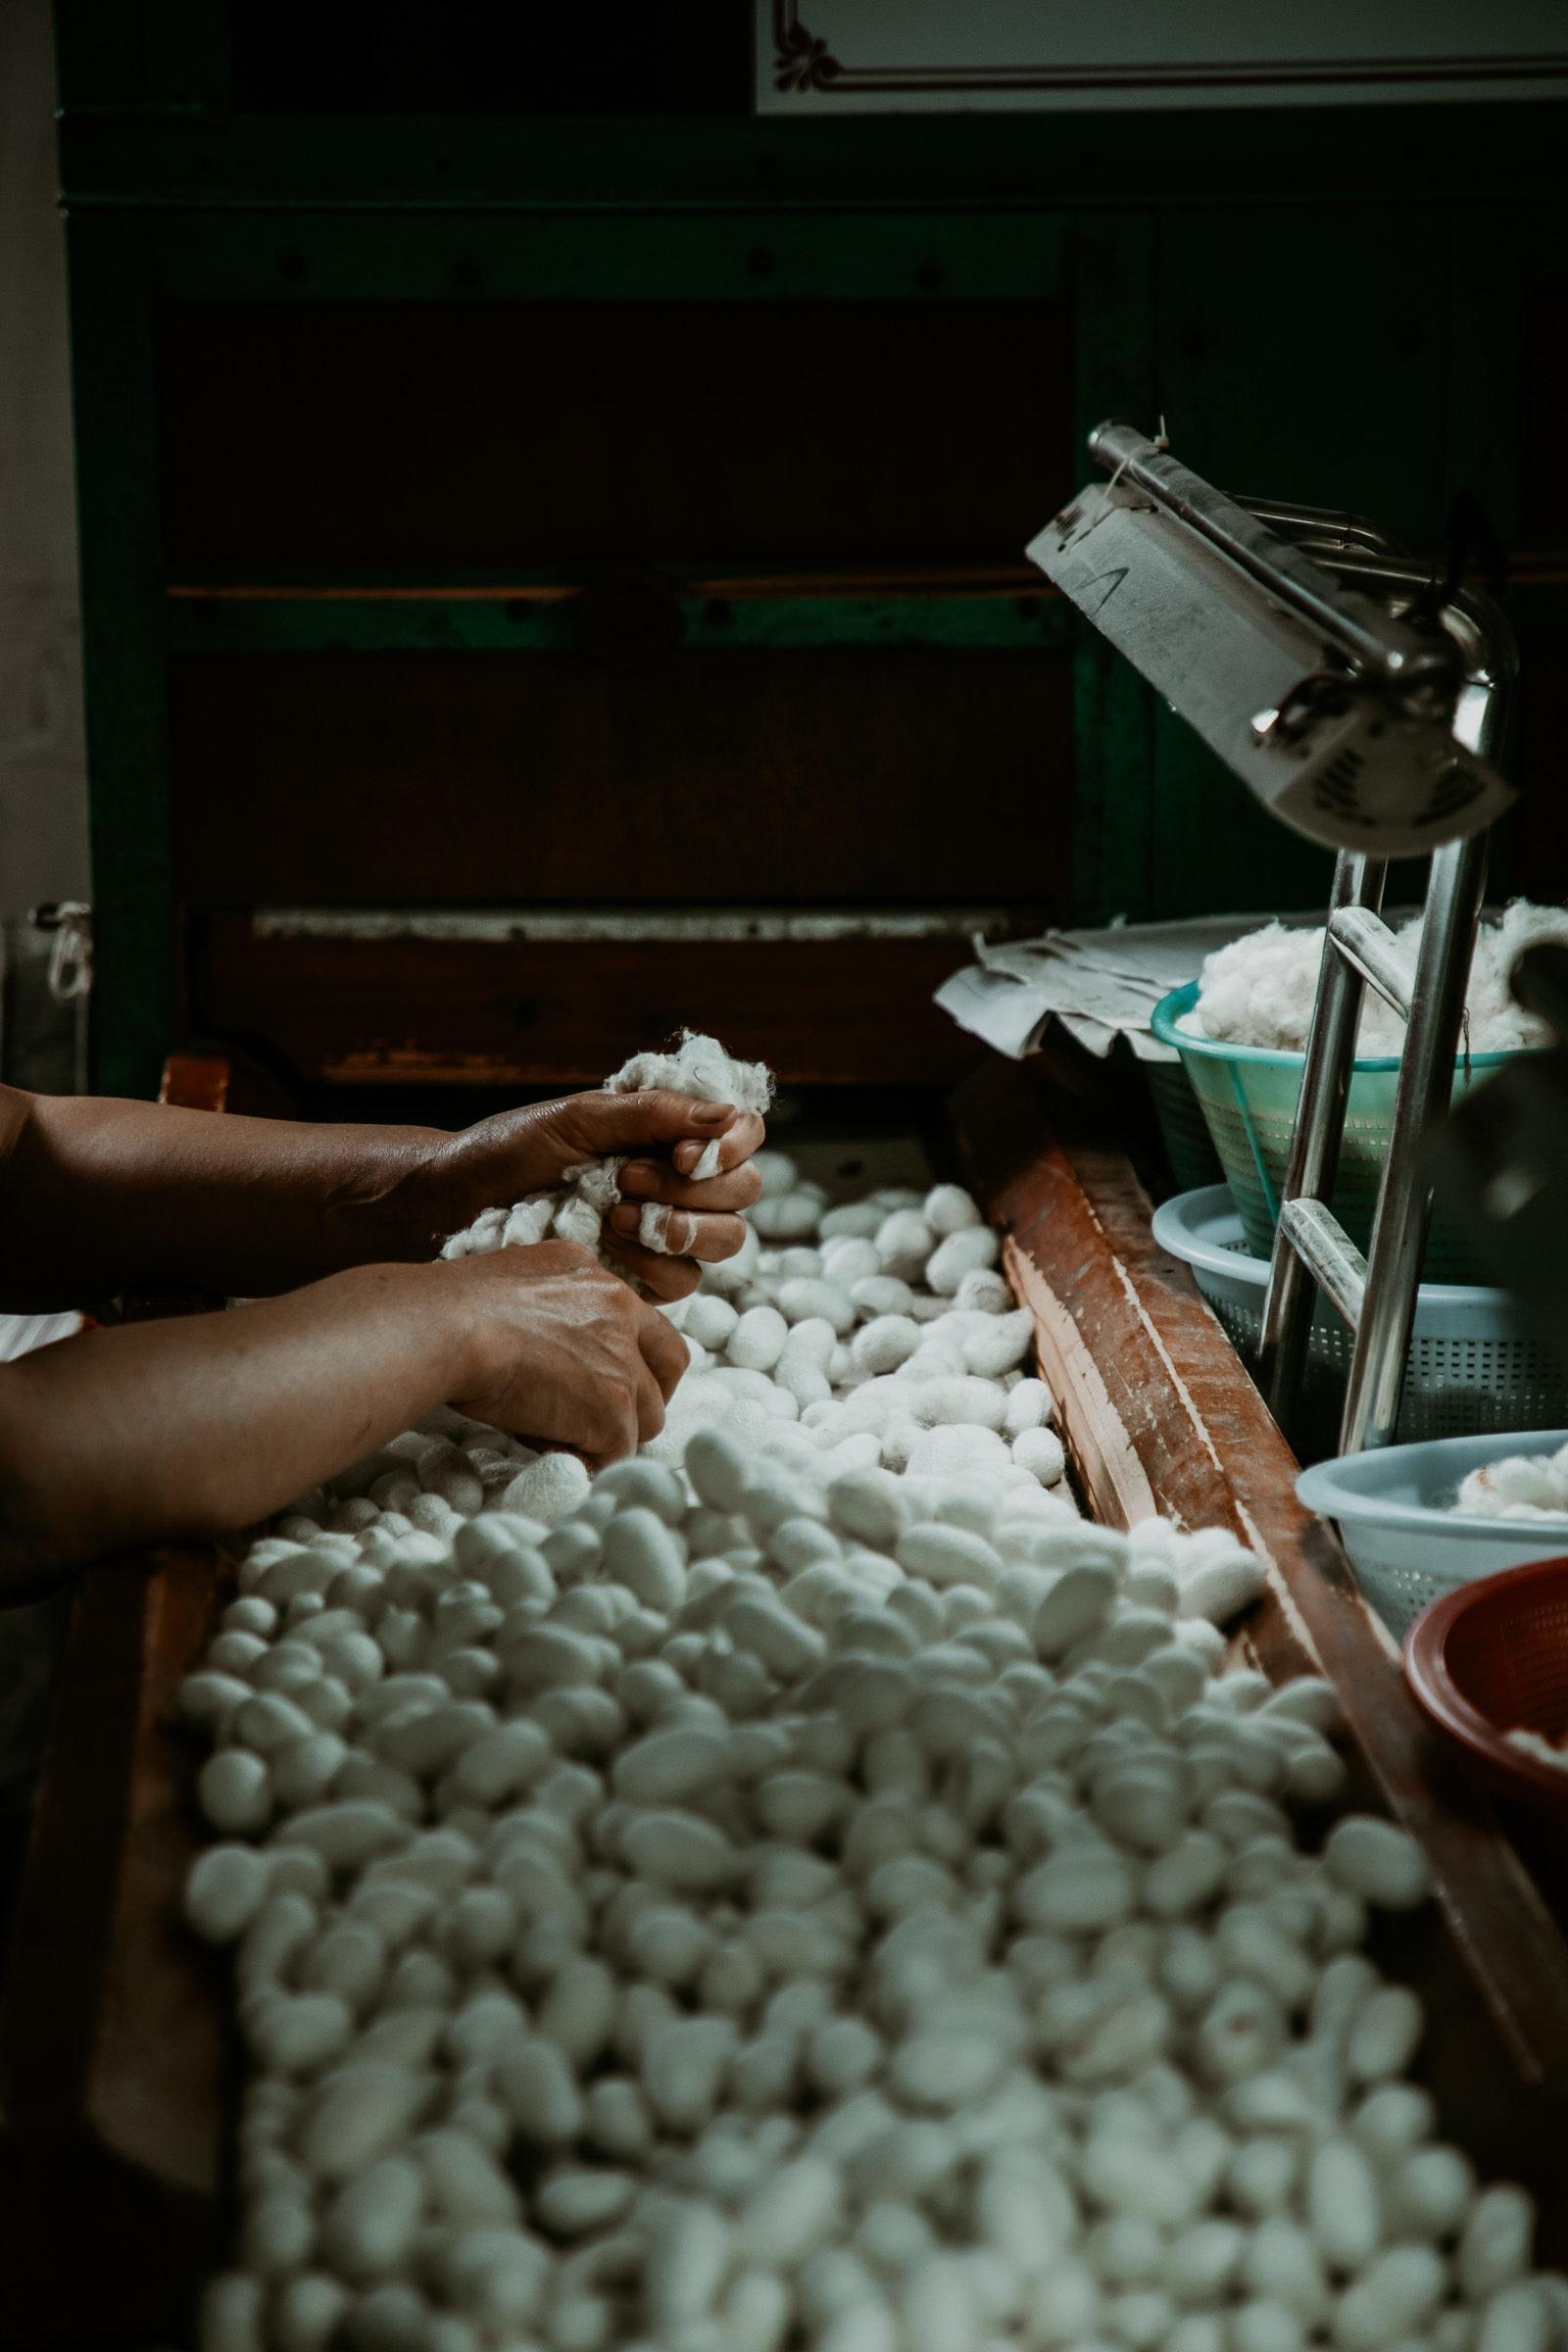 Suzhou Sehenswürdigkeiten Seidenfabrik Kokons Seidenraupe